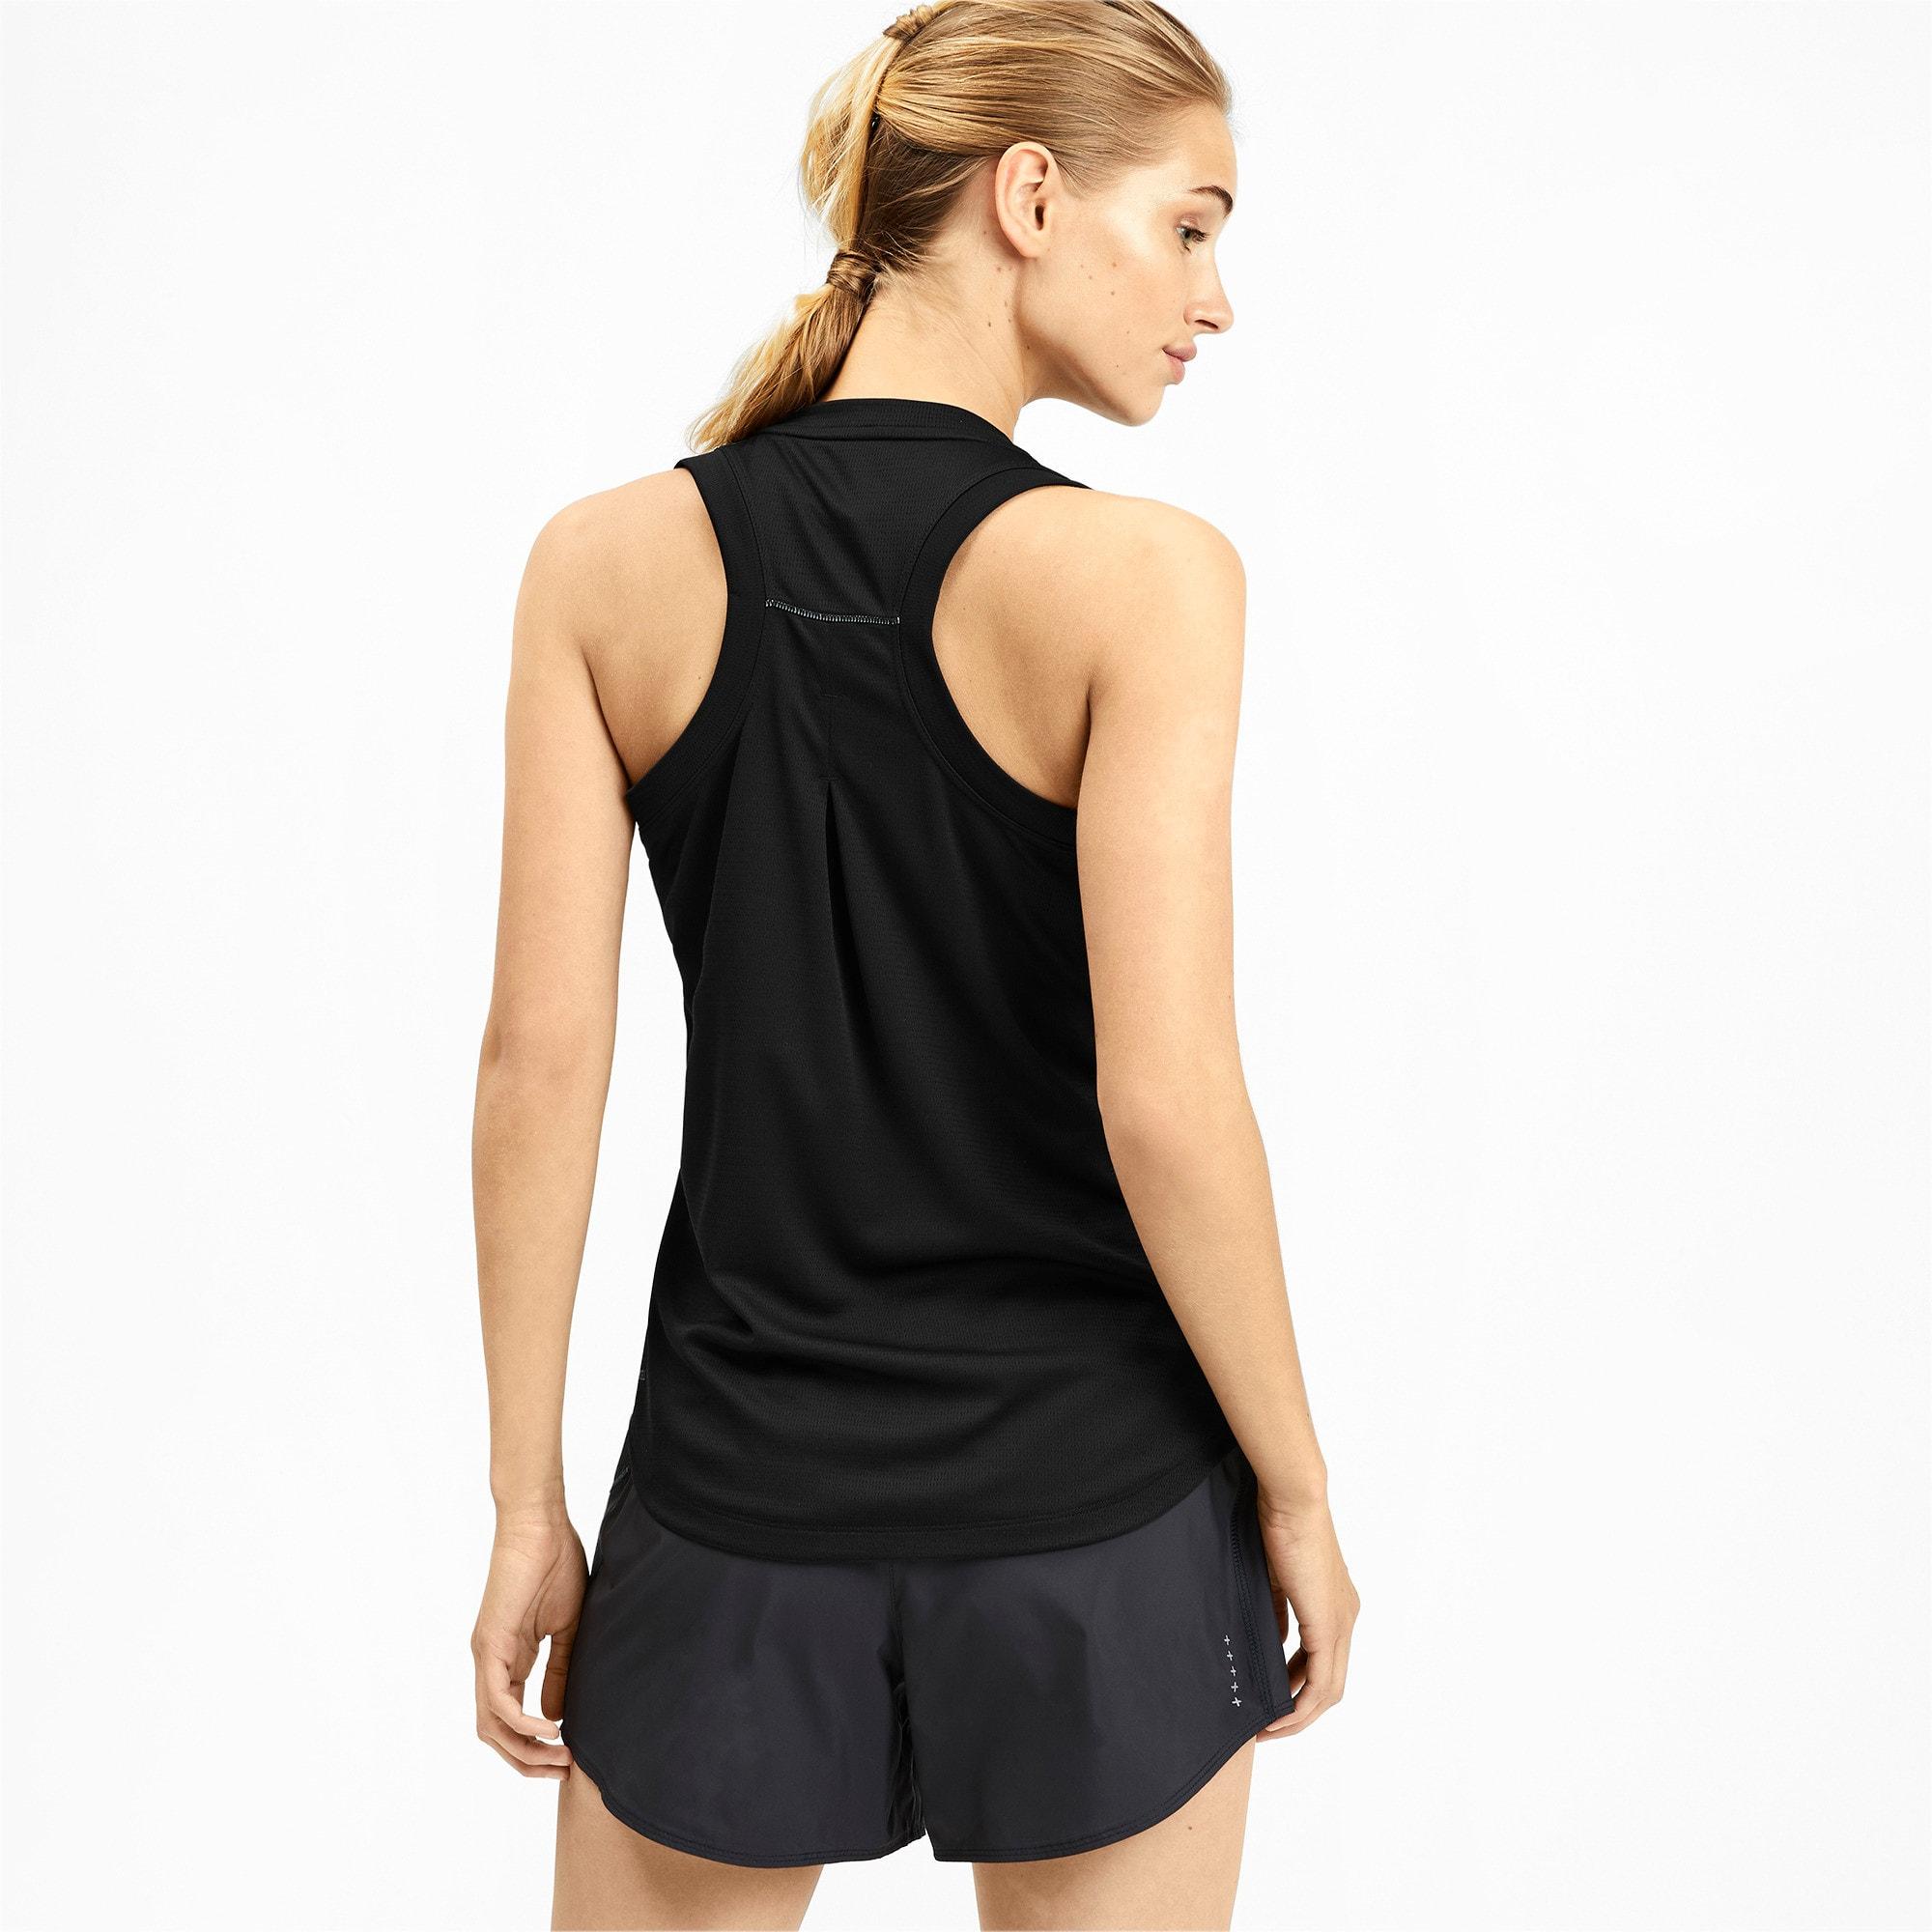 Thumbnail 2 of IGNITE Women's Running Tank Top, Puma Black, medium